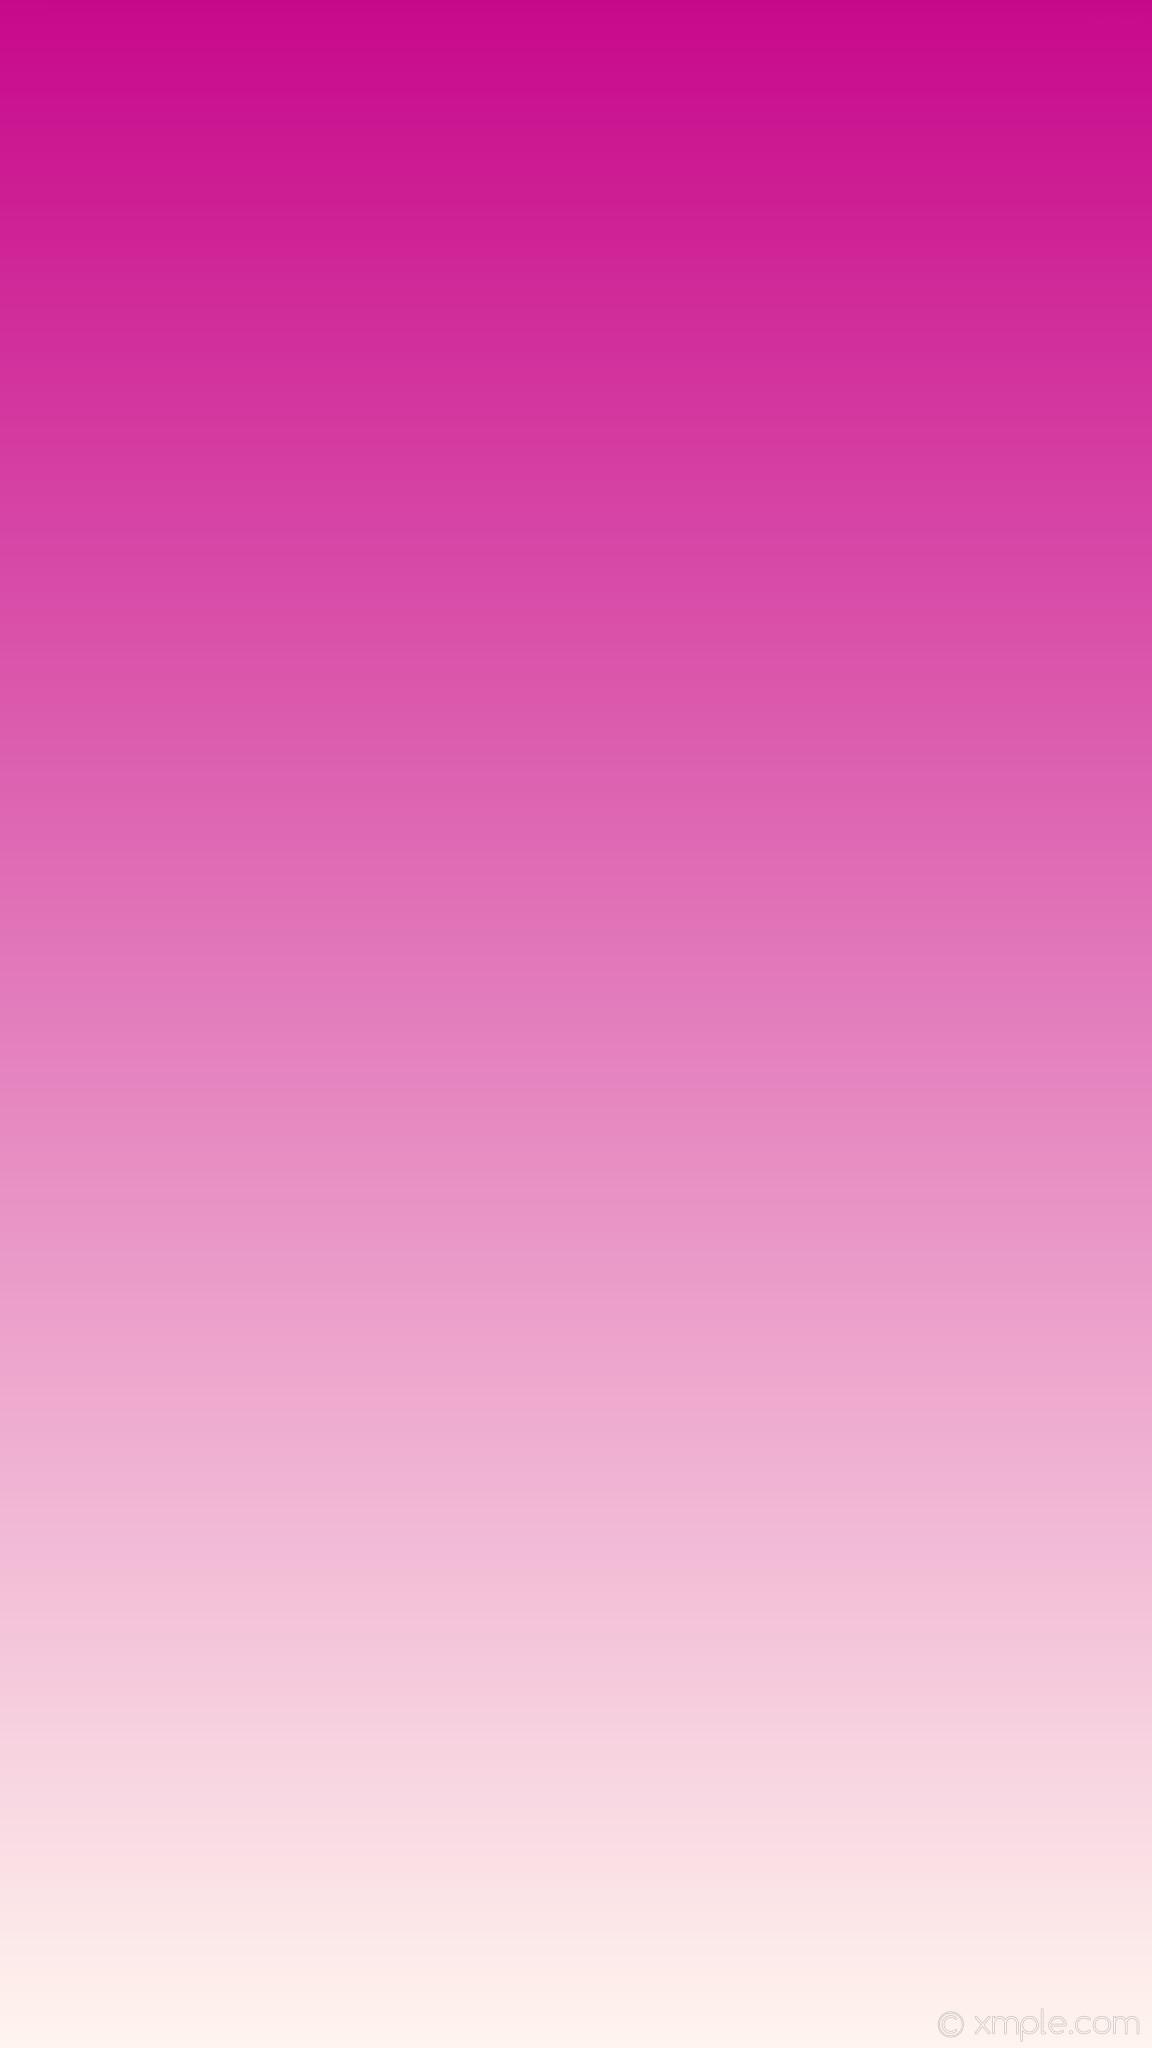 wallpaper gradient white pink linear seashell #c8088b #fff5ee 90°